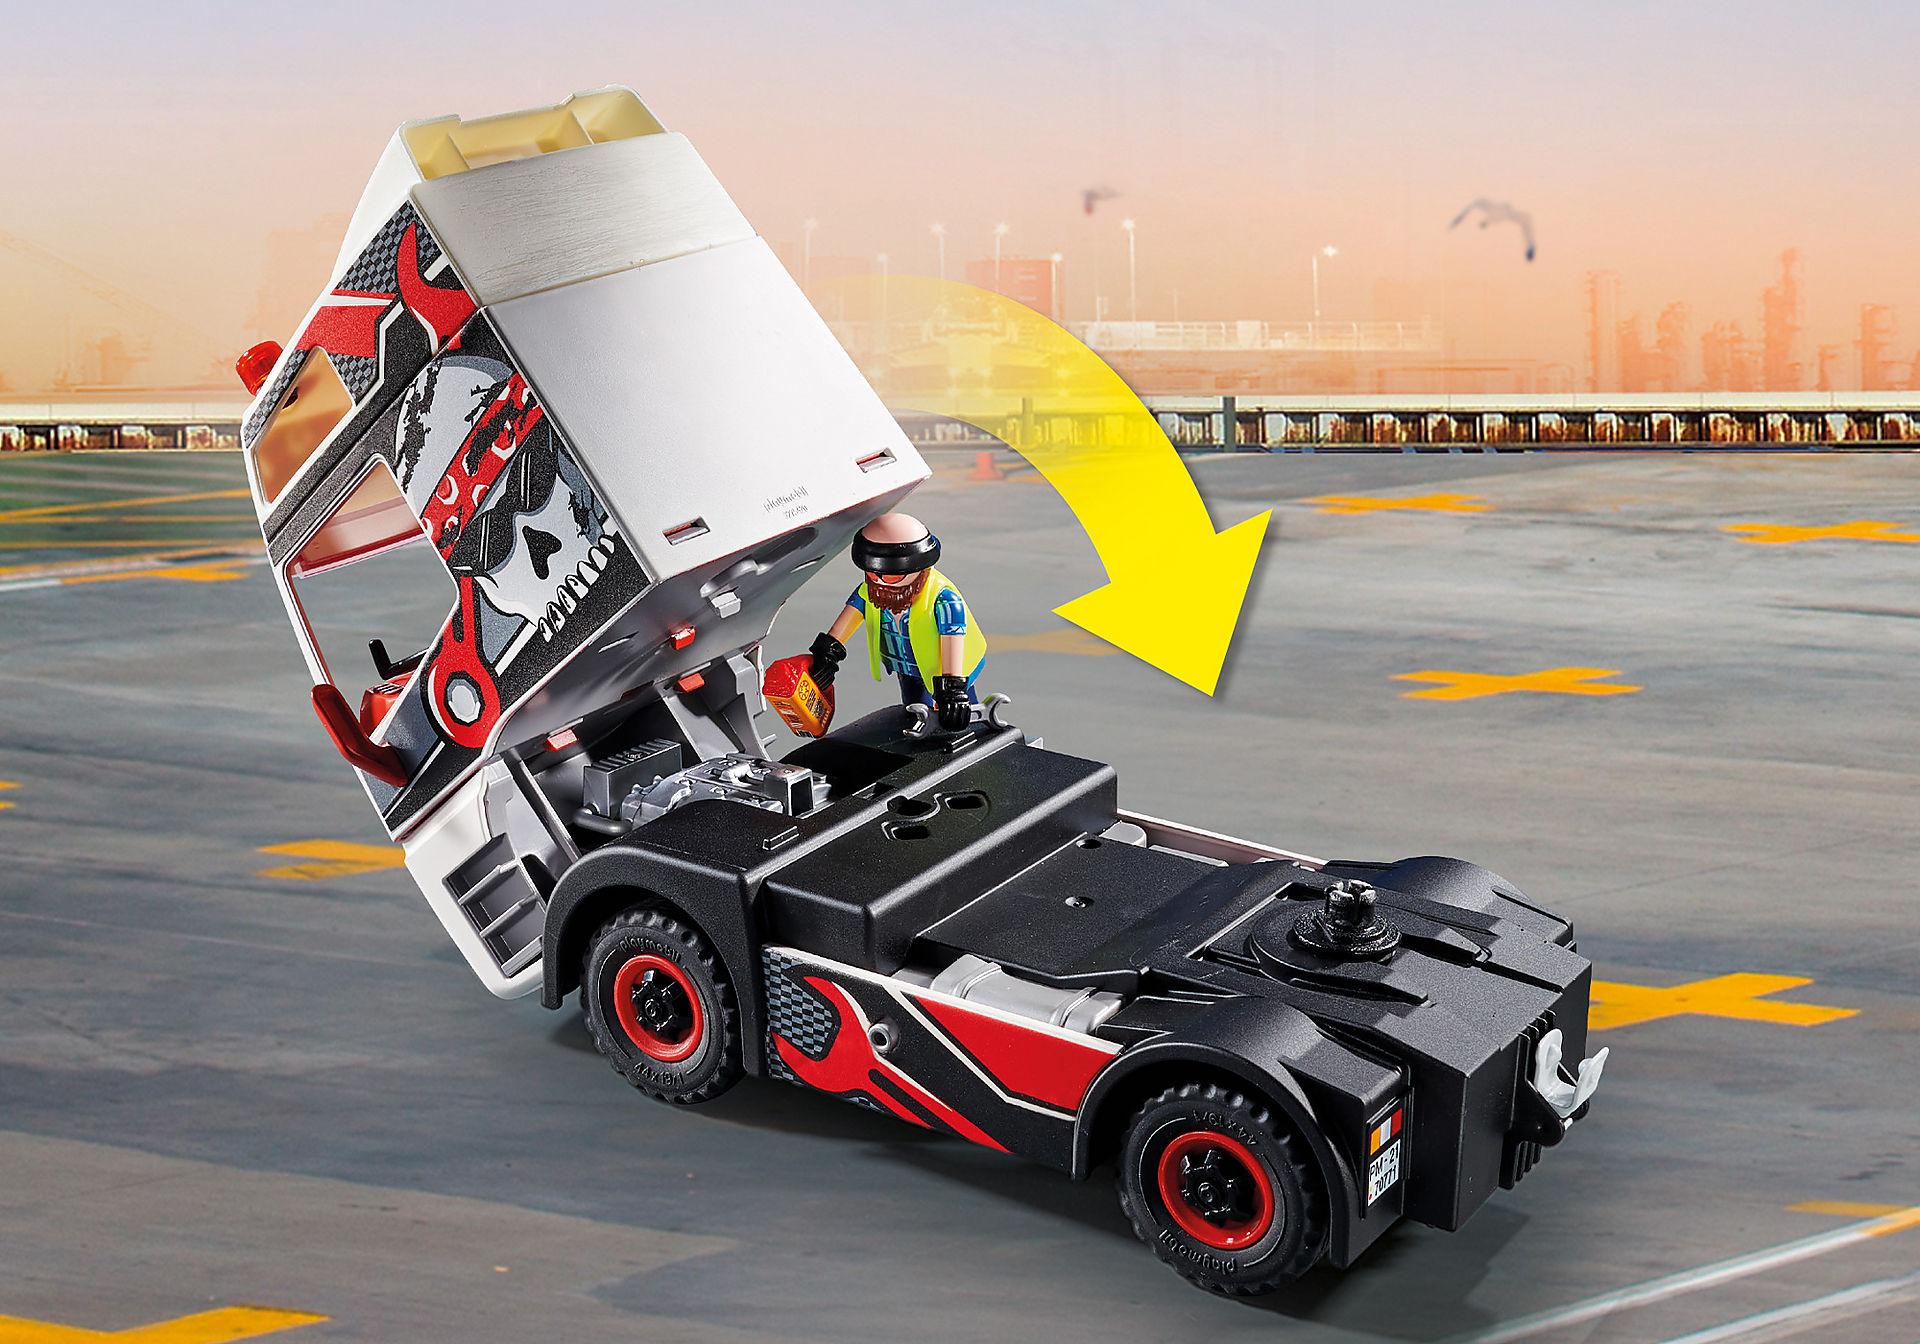 70771 Lastbil med lastcontainer zoom image4